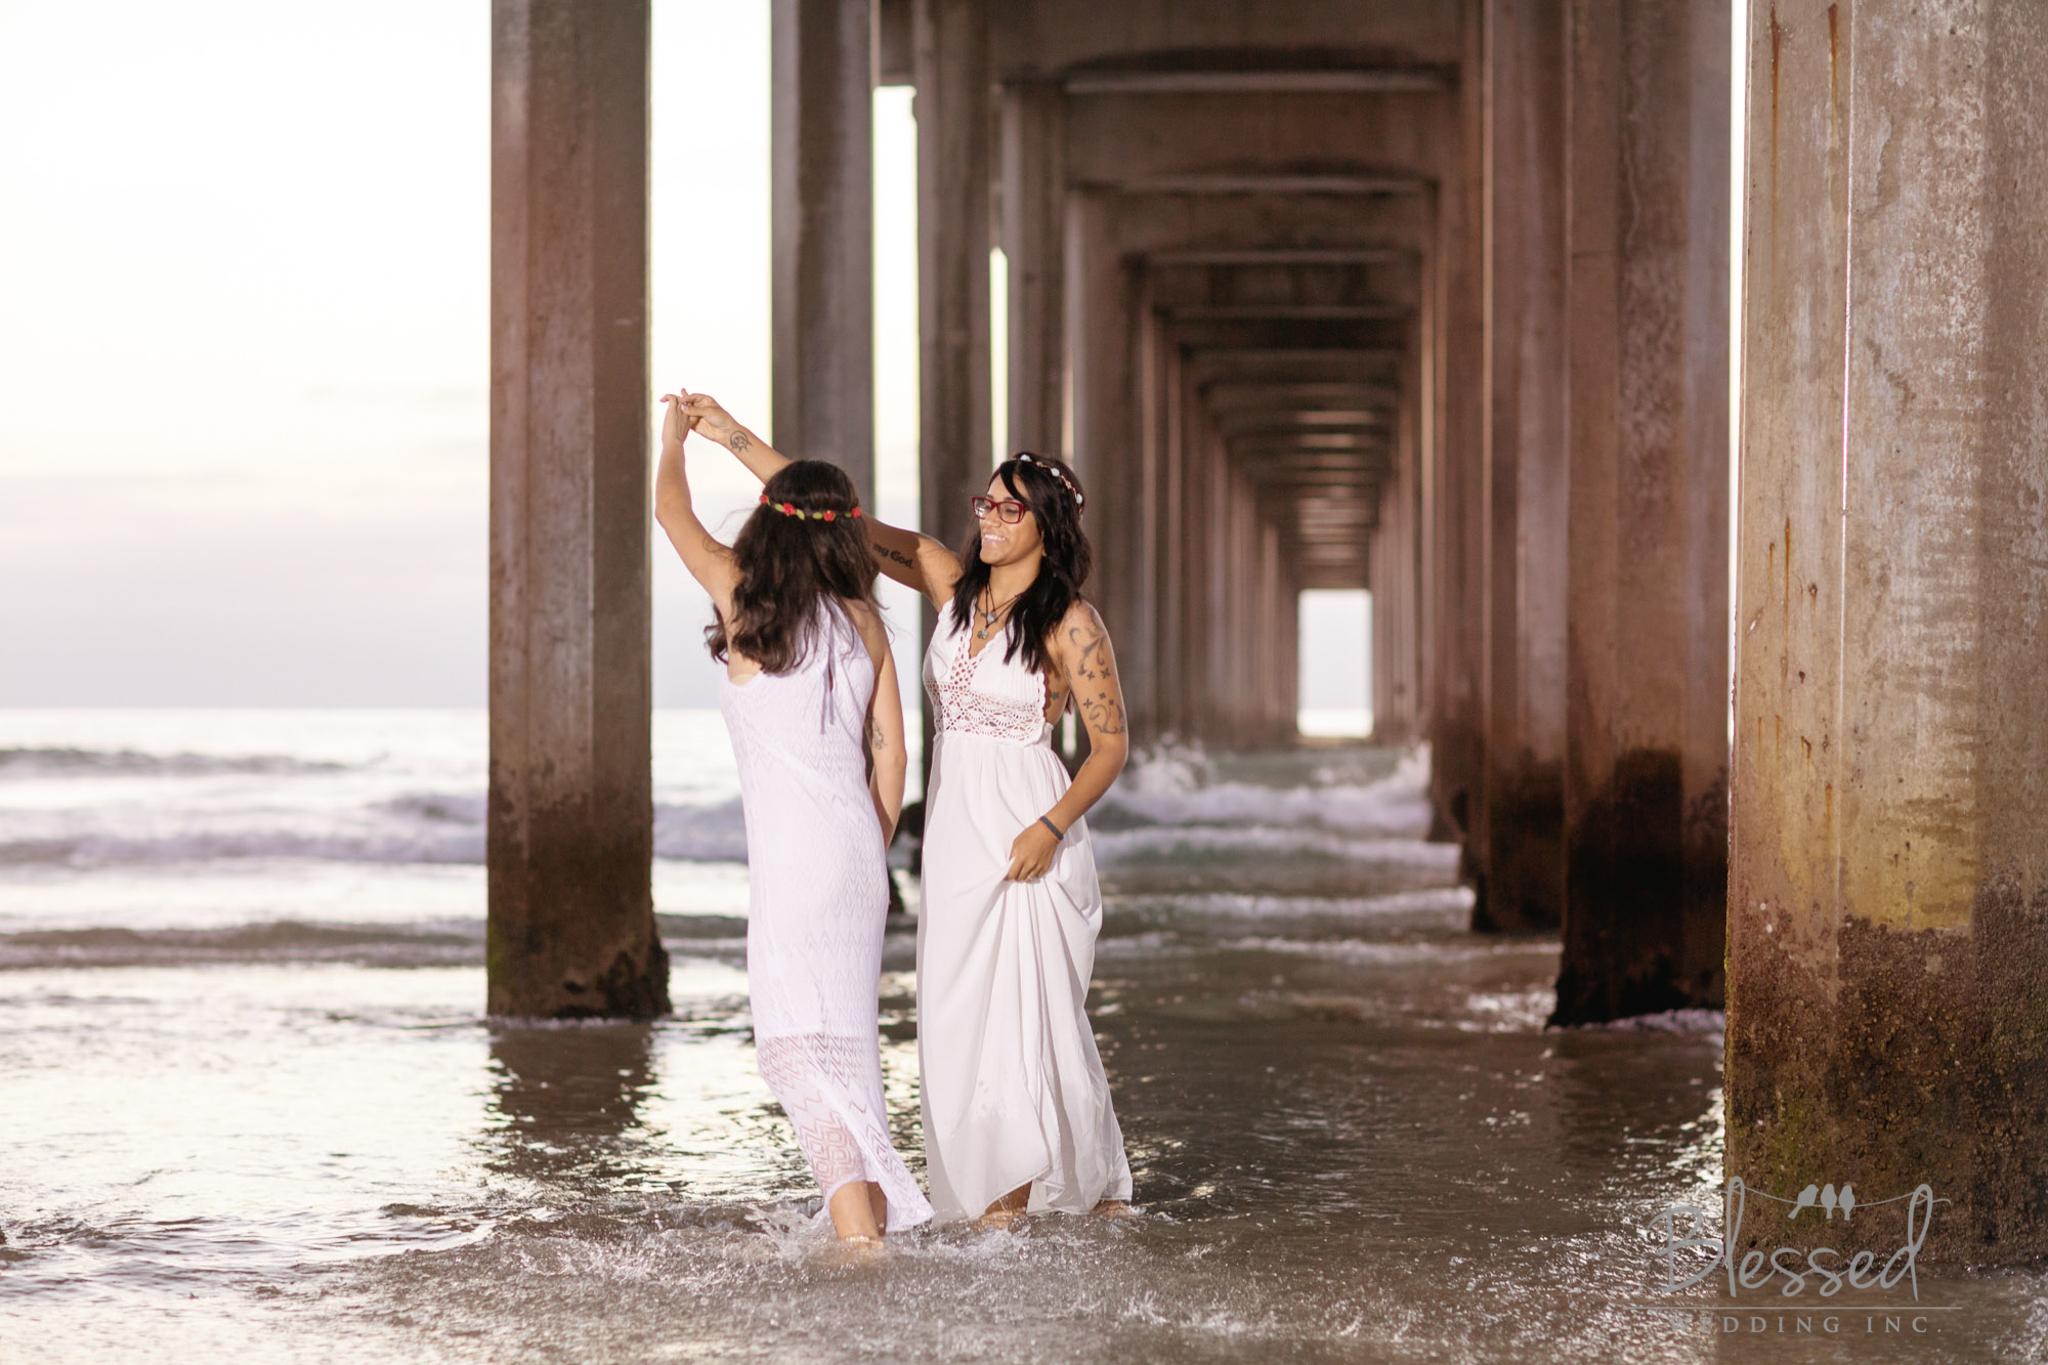 La Jolla Beach Engagement Session by San Diego Wedding Photographers Blessed Wedding-59.jpg